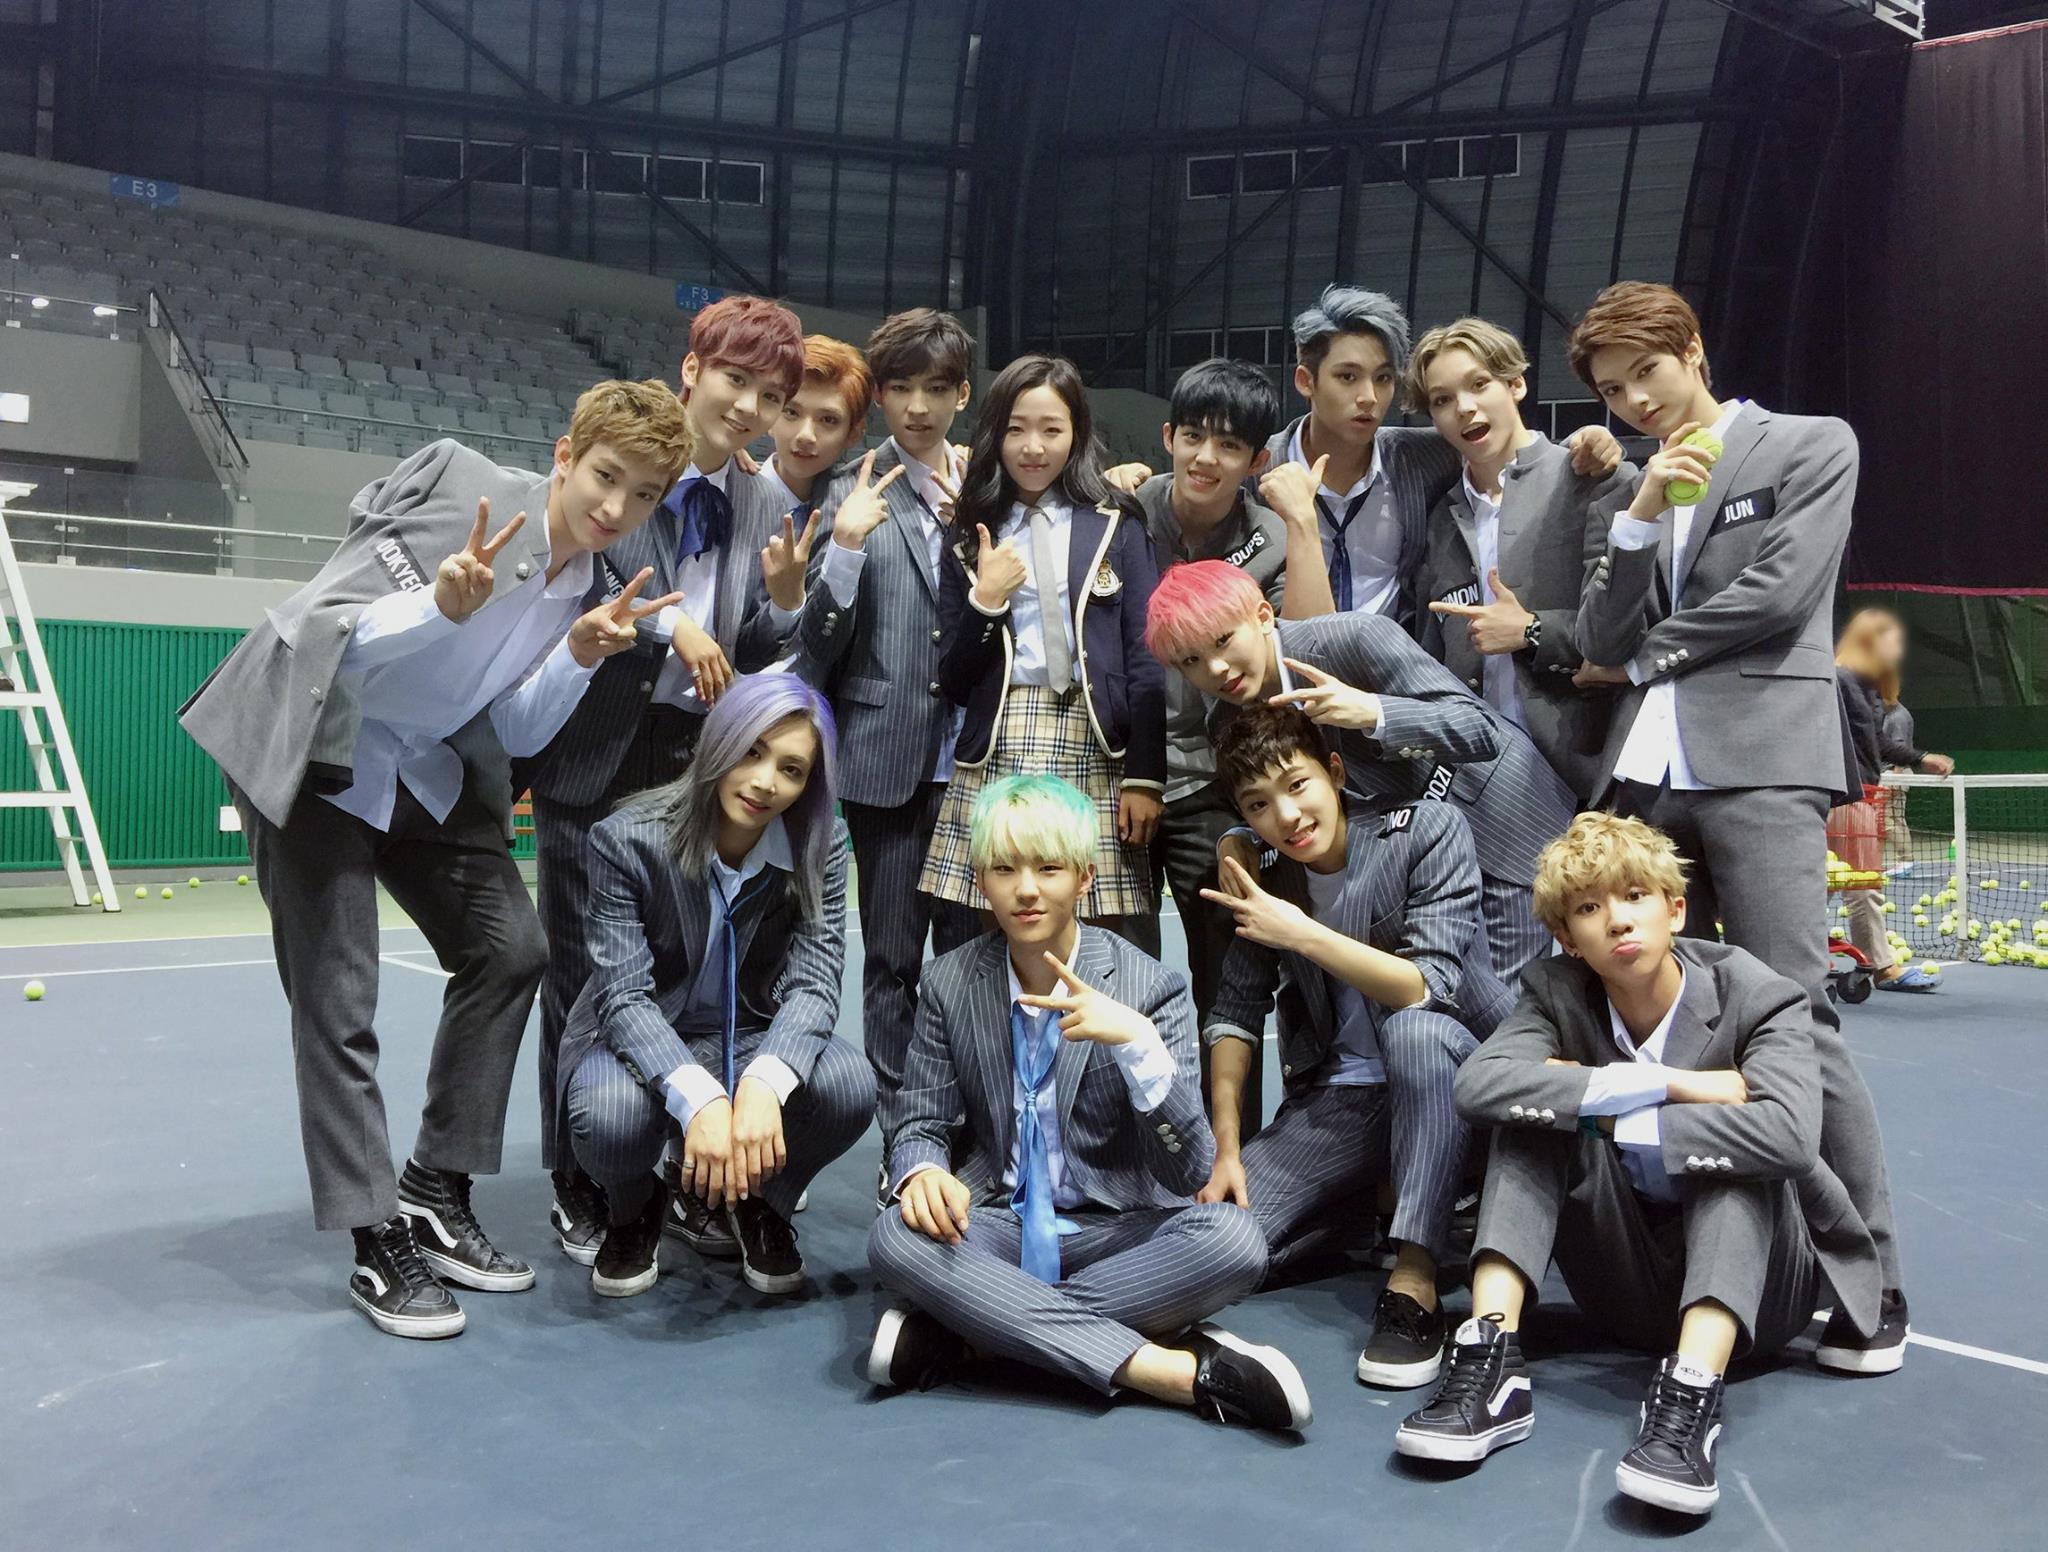 school uniform, kpop school uniform, school uniform kpop, school uniform concept, kpop school uniform concept, seventeen school uniform